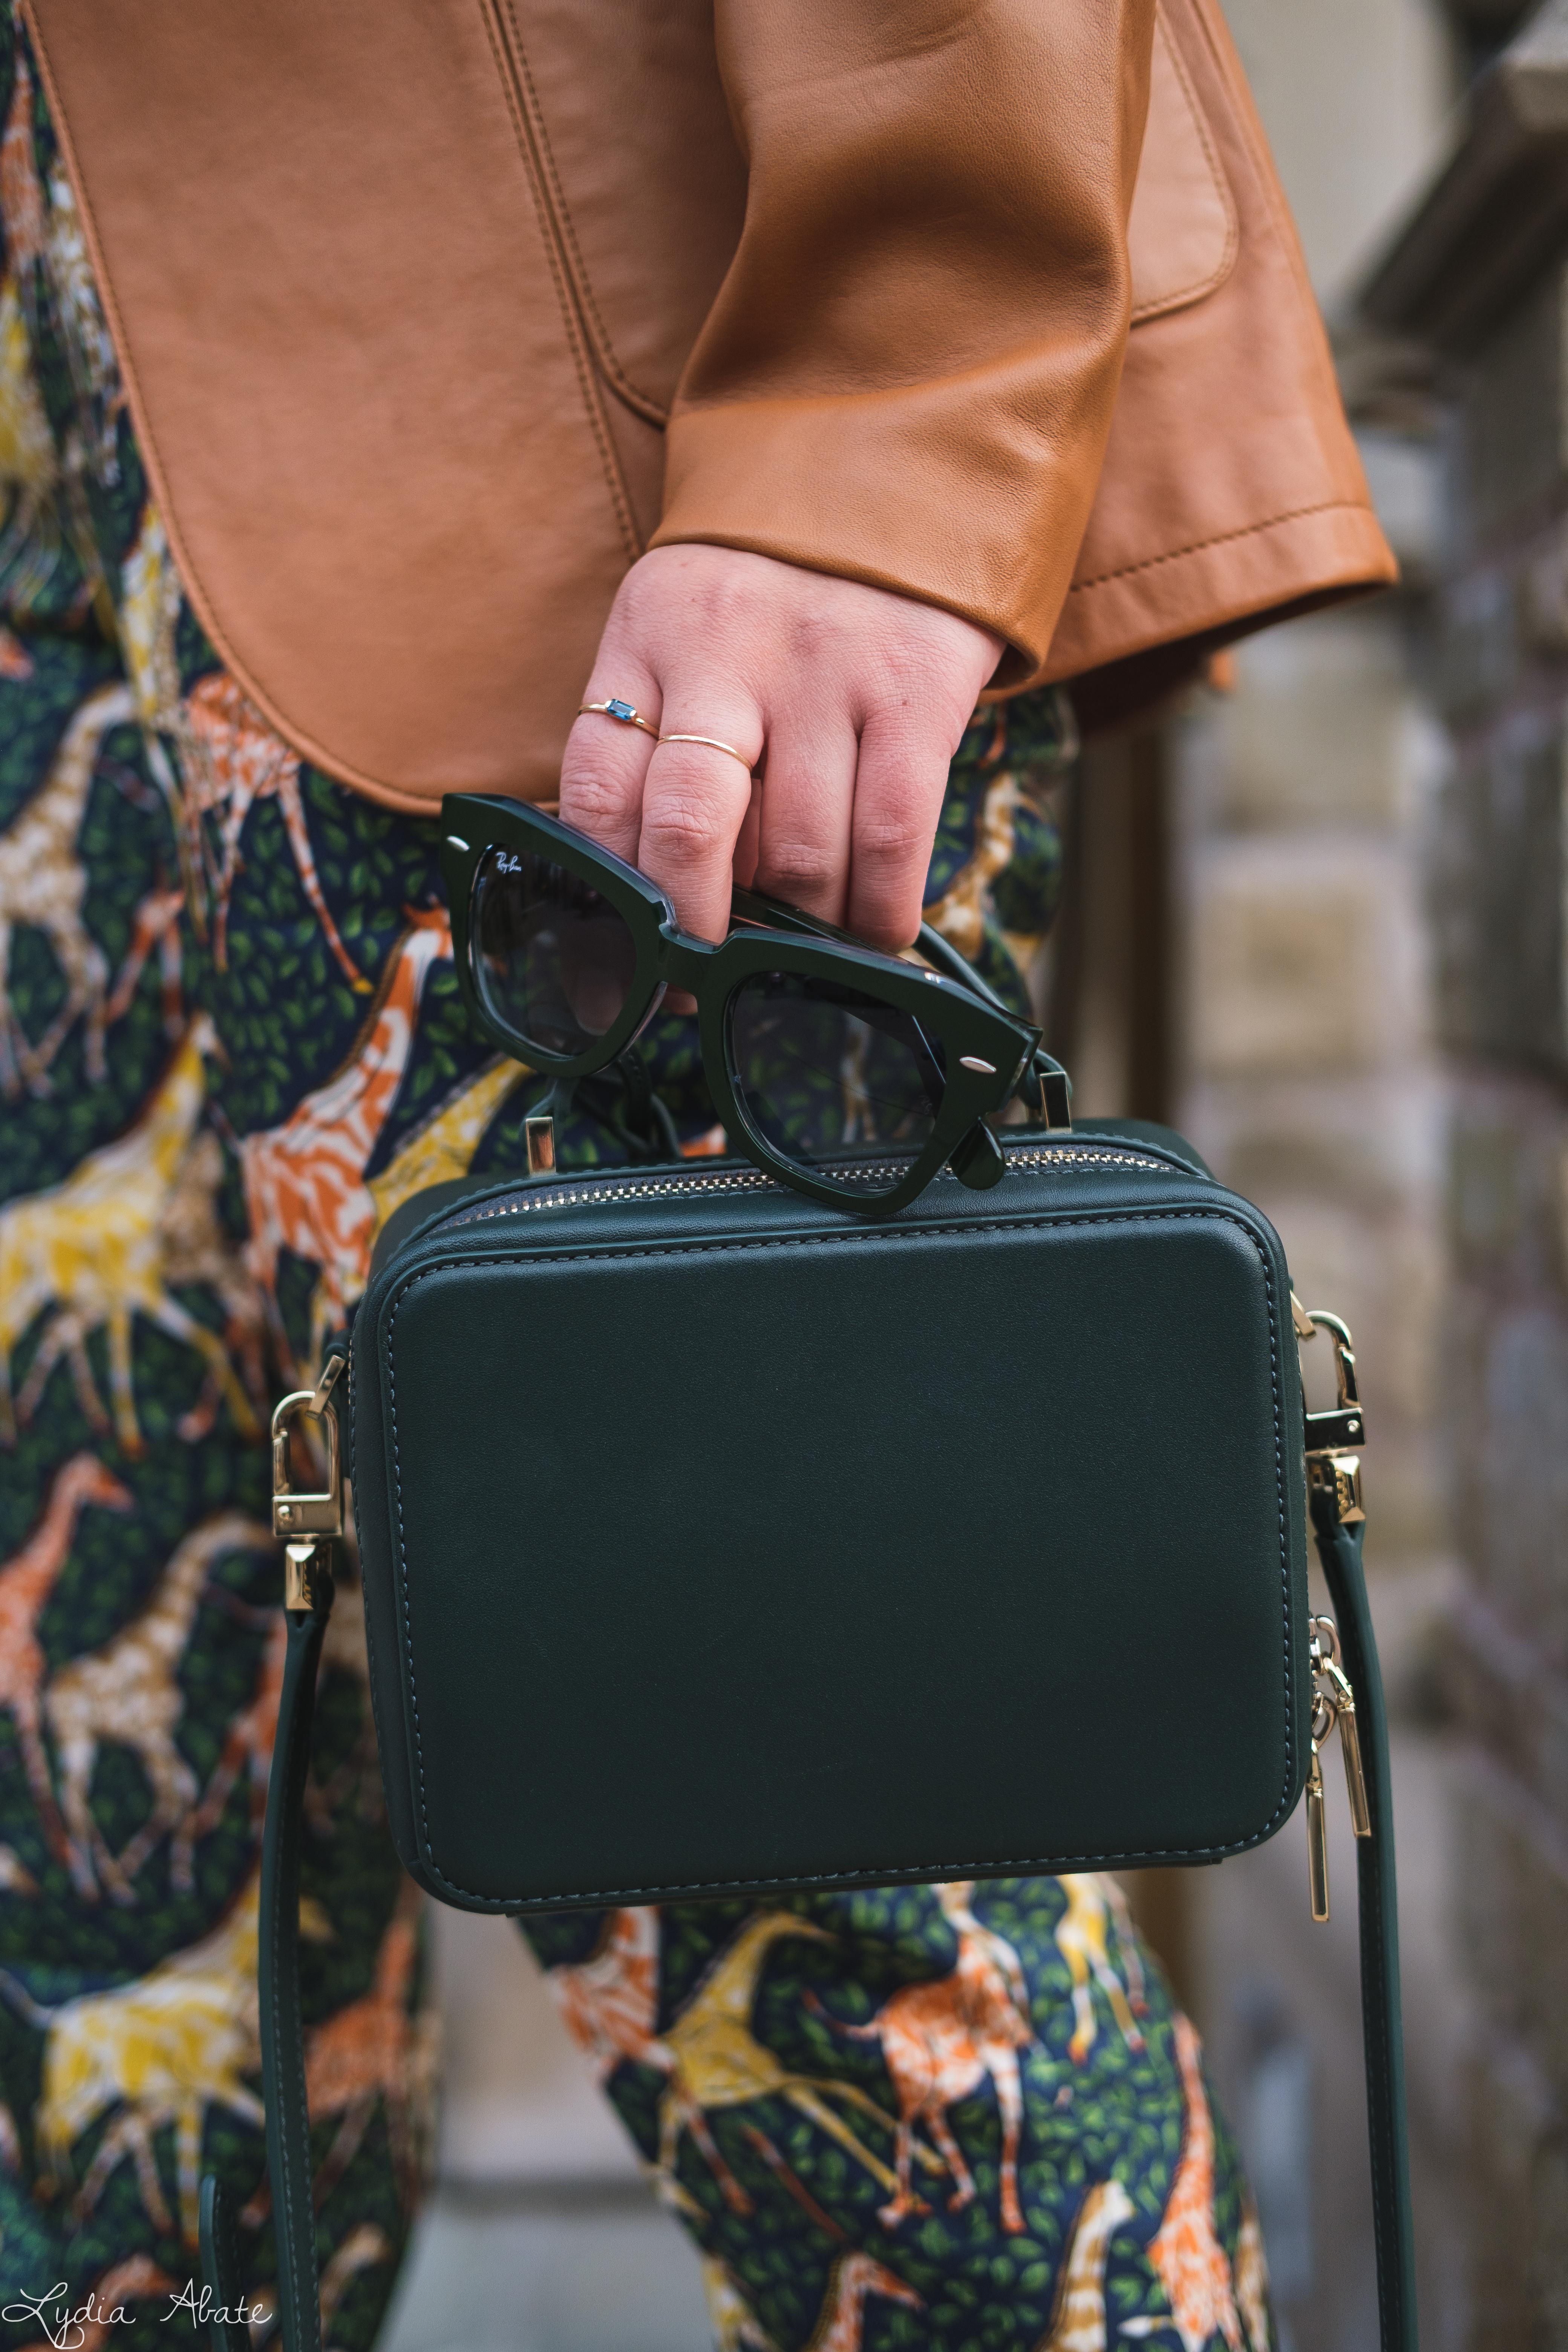 giraffe pants, leather blazer knit top, green bag, croc heels-13.jpg